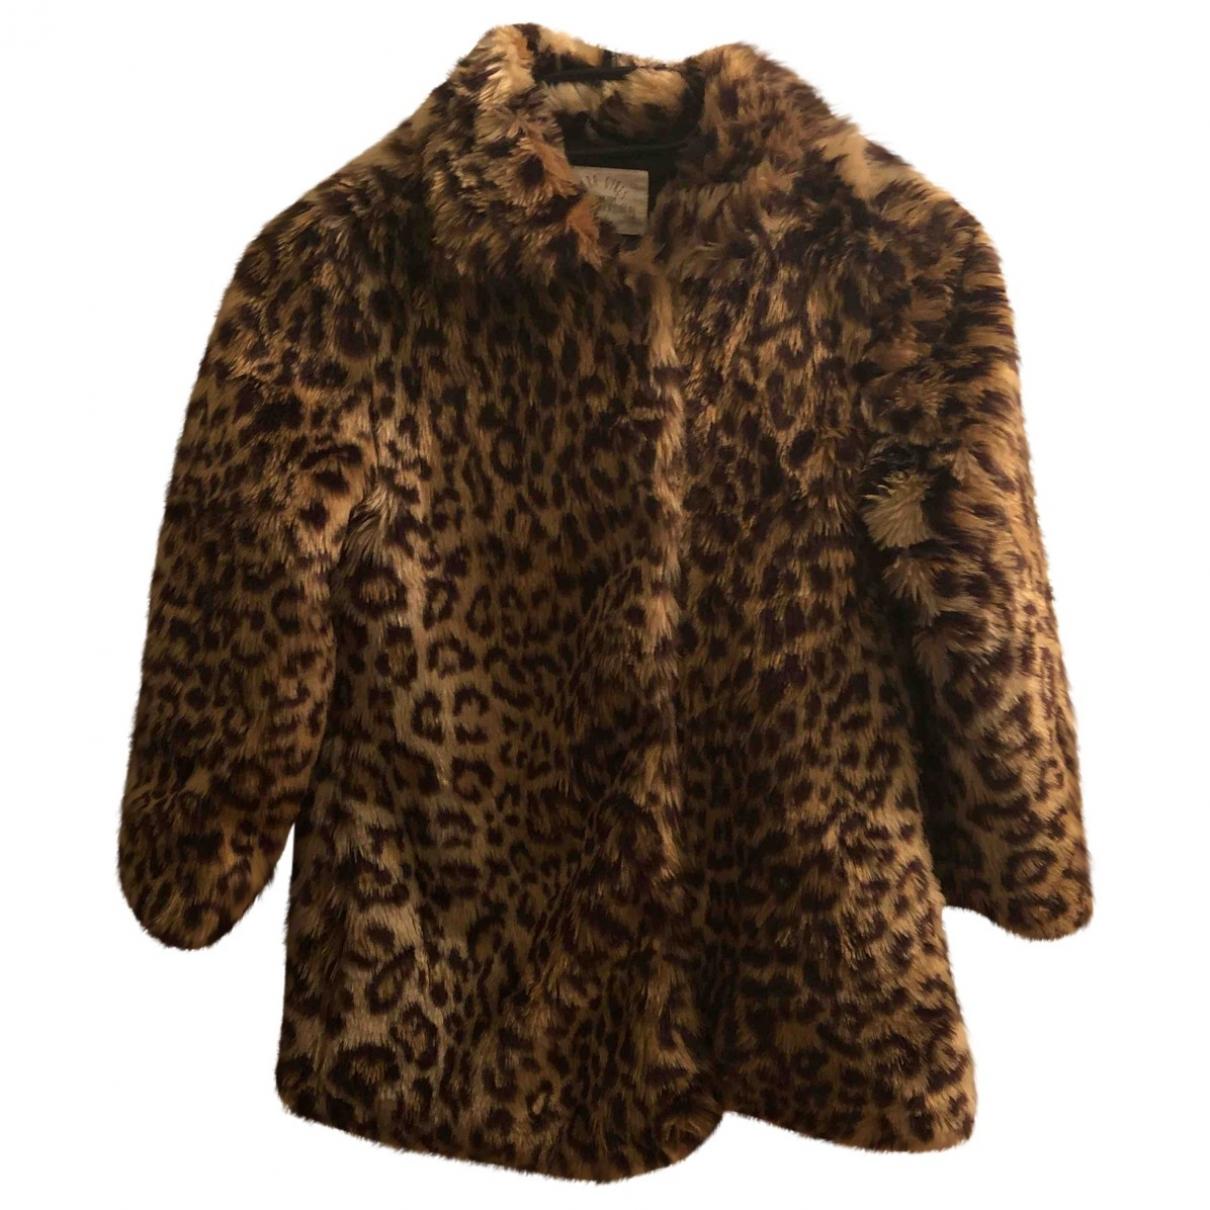 Zara \N jacket & coat for Kids 8 years - up to 128cm FR